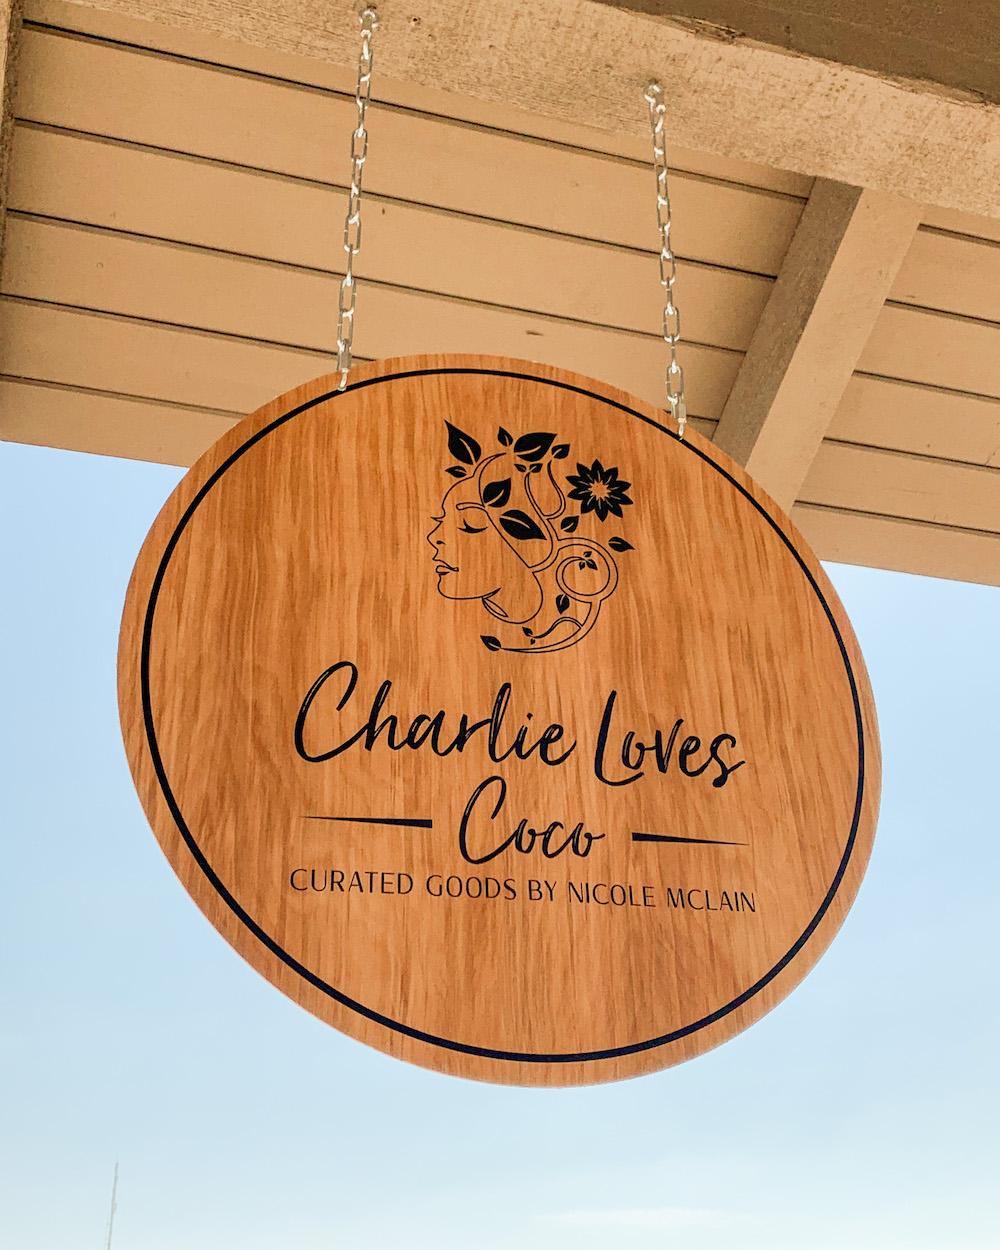 charlie loves coco address